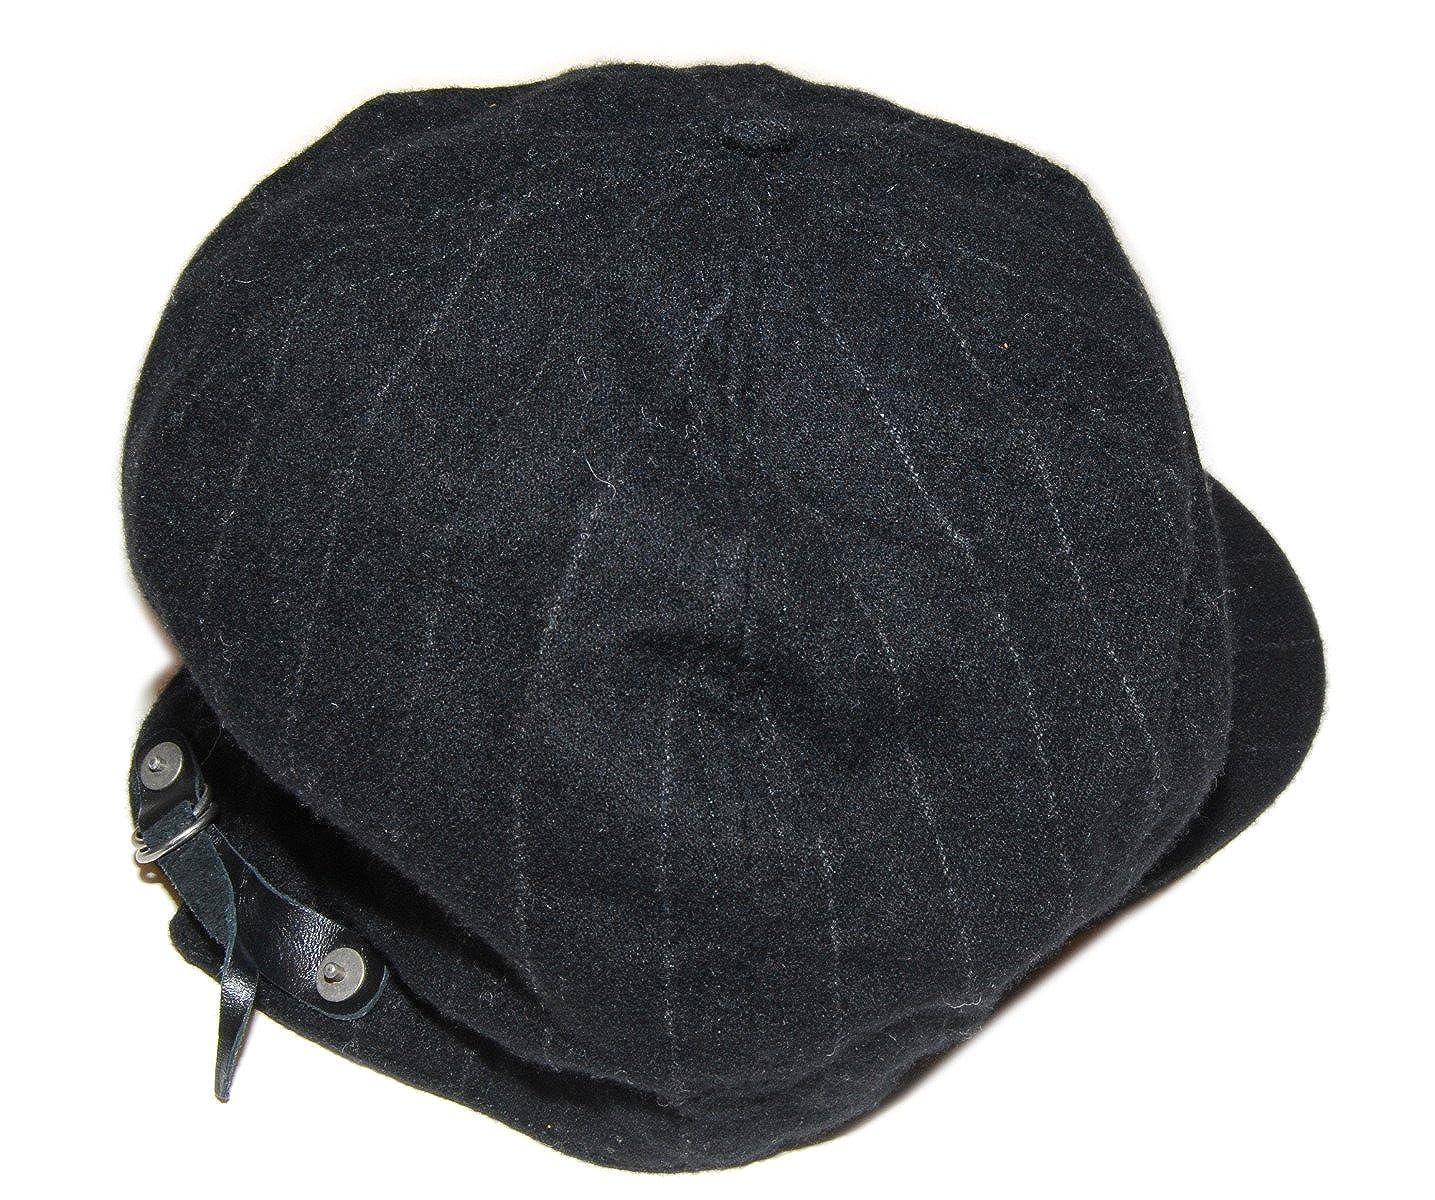 1fd1b3b19 Ralph Lauren Rugby Mens Vintage Wool 1920 s Newsboy Pinstripe Hat Cap Black  S M at Amazon Men s Clothing store